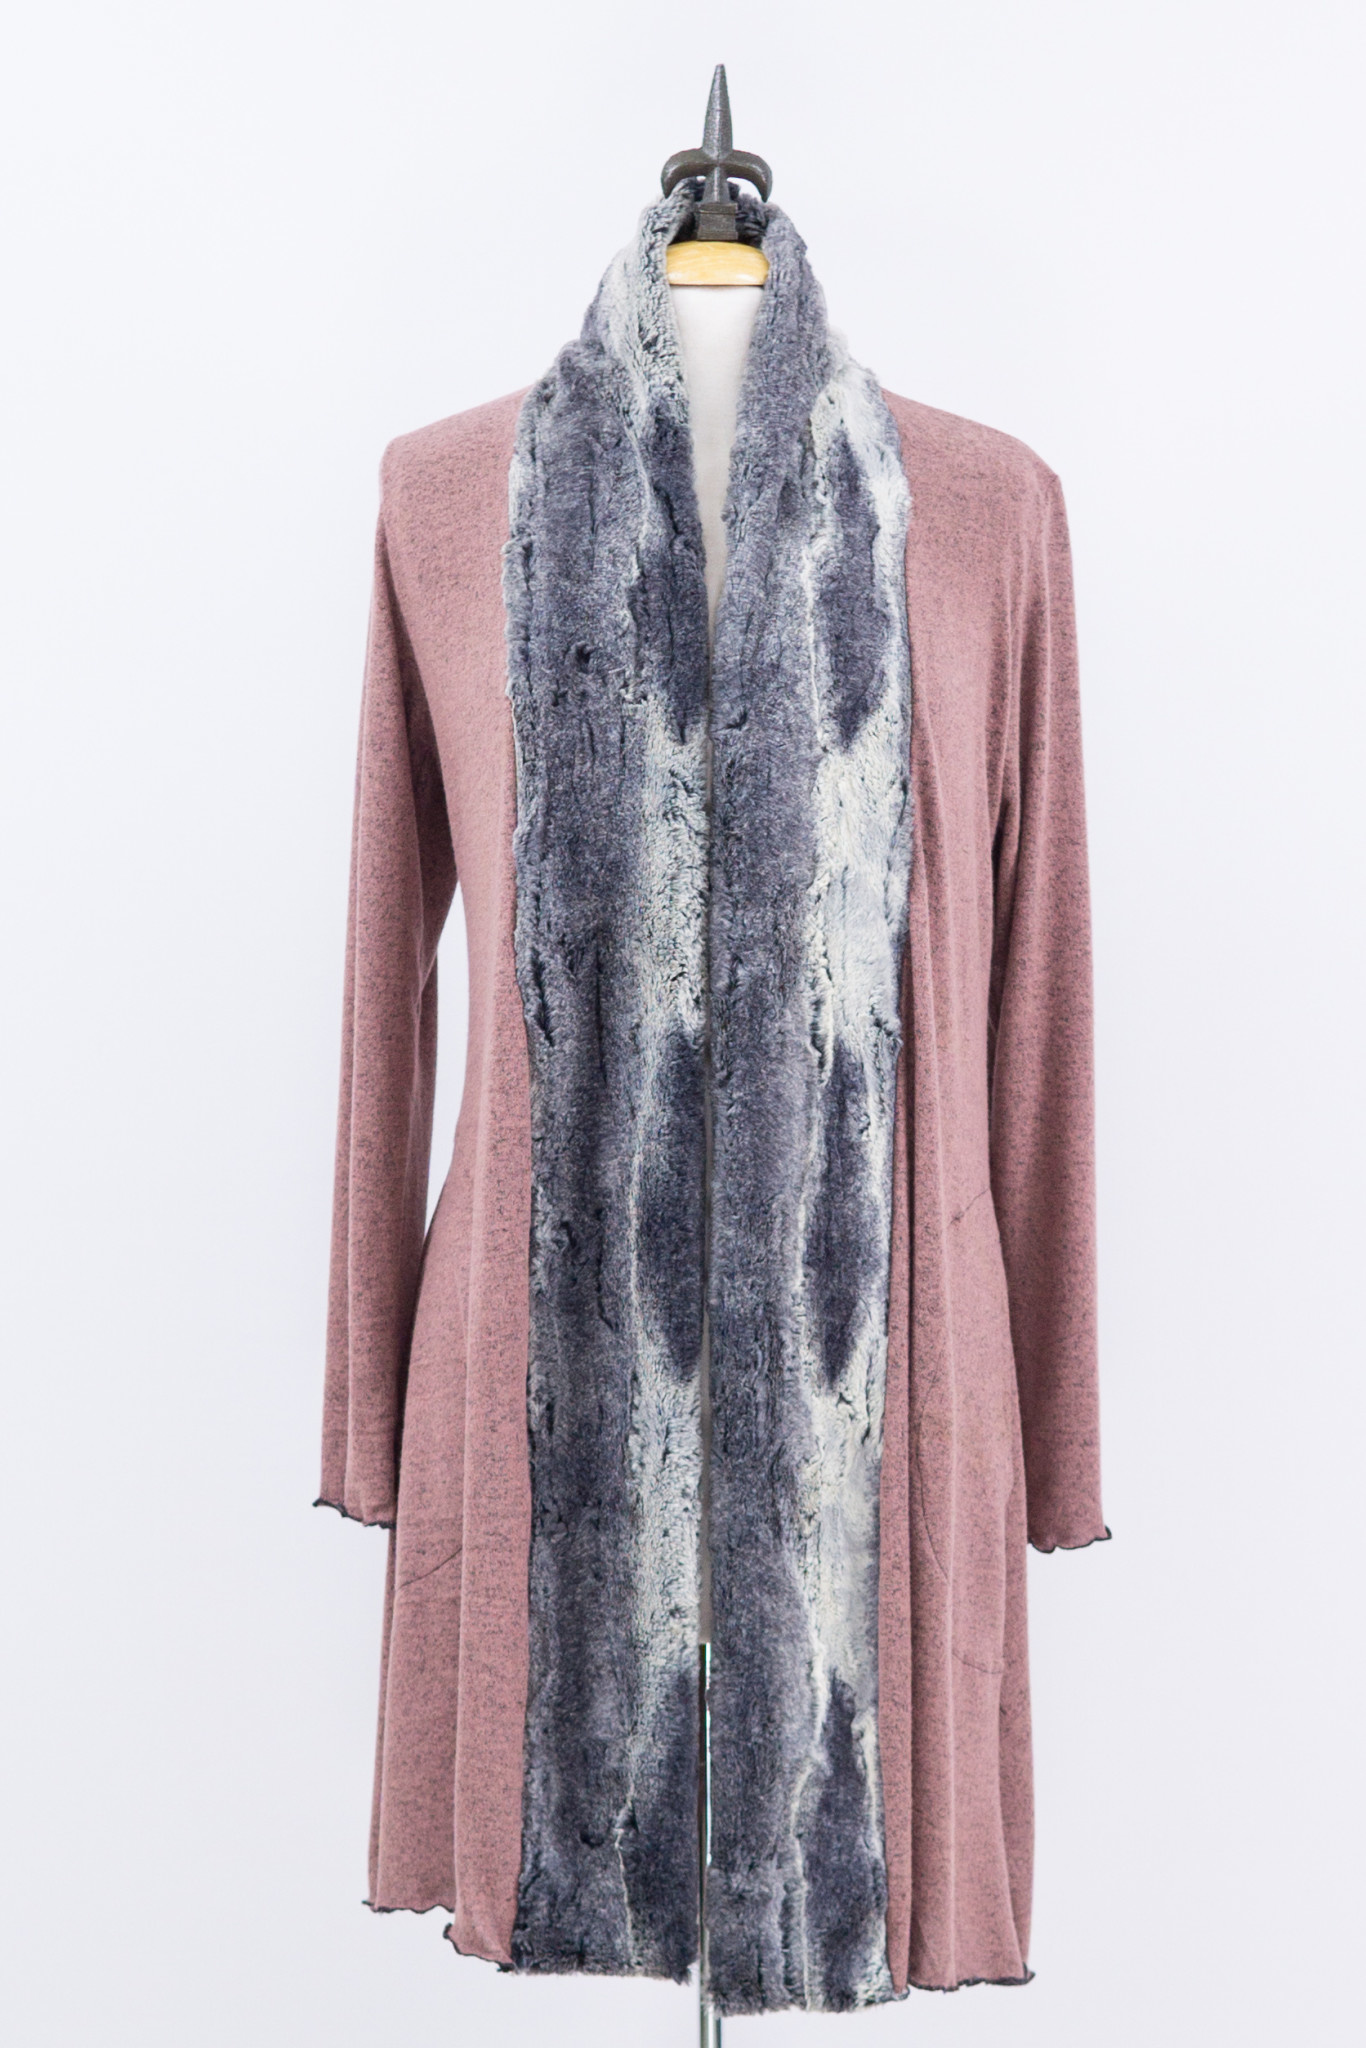 Aspen Fur Trimmed Cardigan